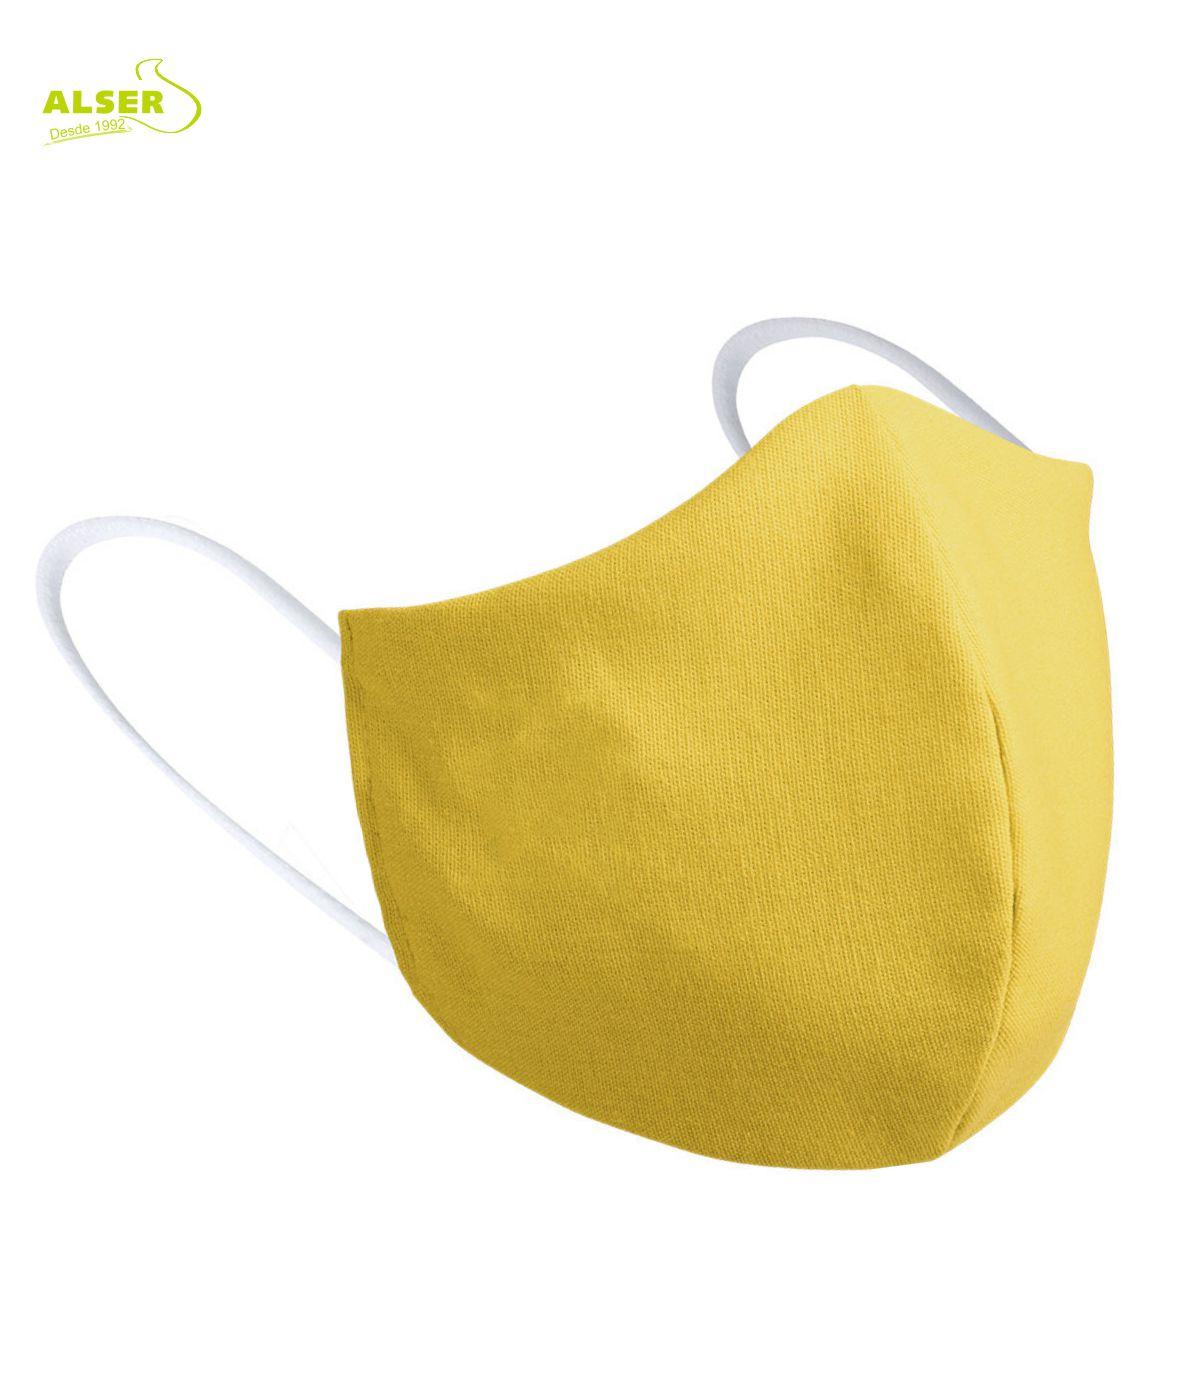 mascarilla infantil reutilizable. Personalizable. amarilla